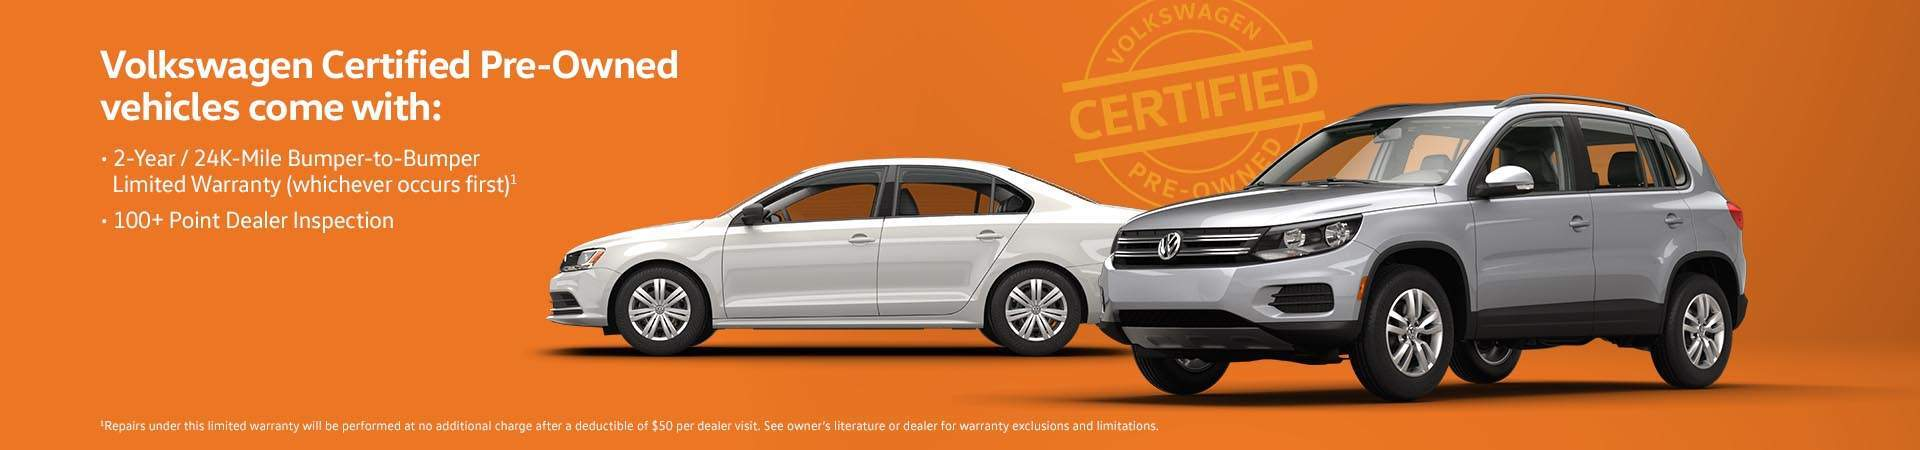 Volkswagen Dealership San Juan Capistrano Ca Used Cars